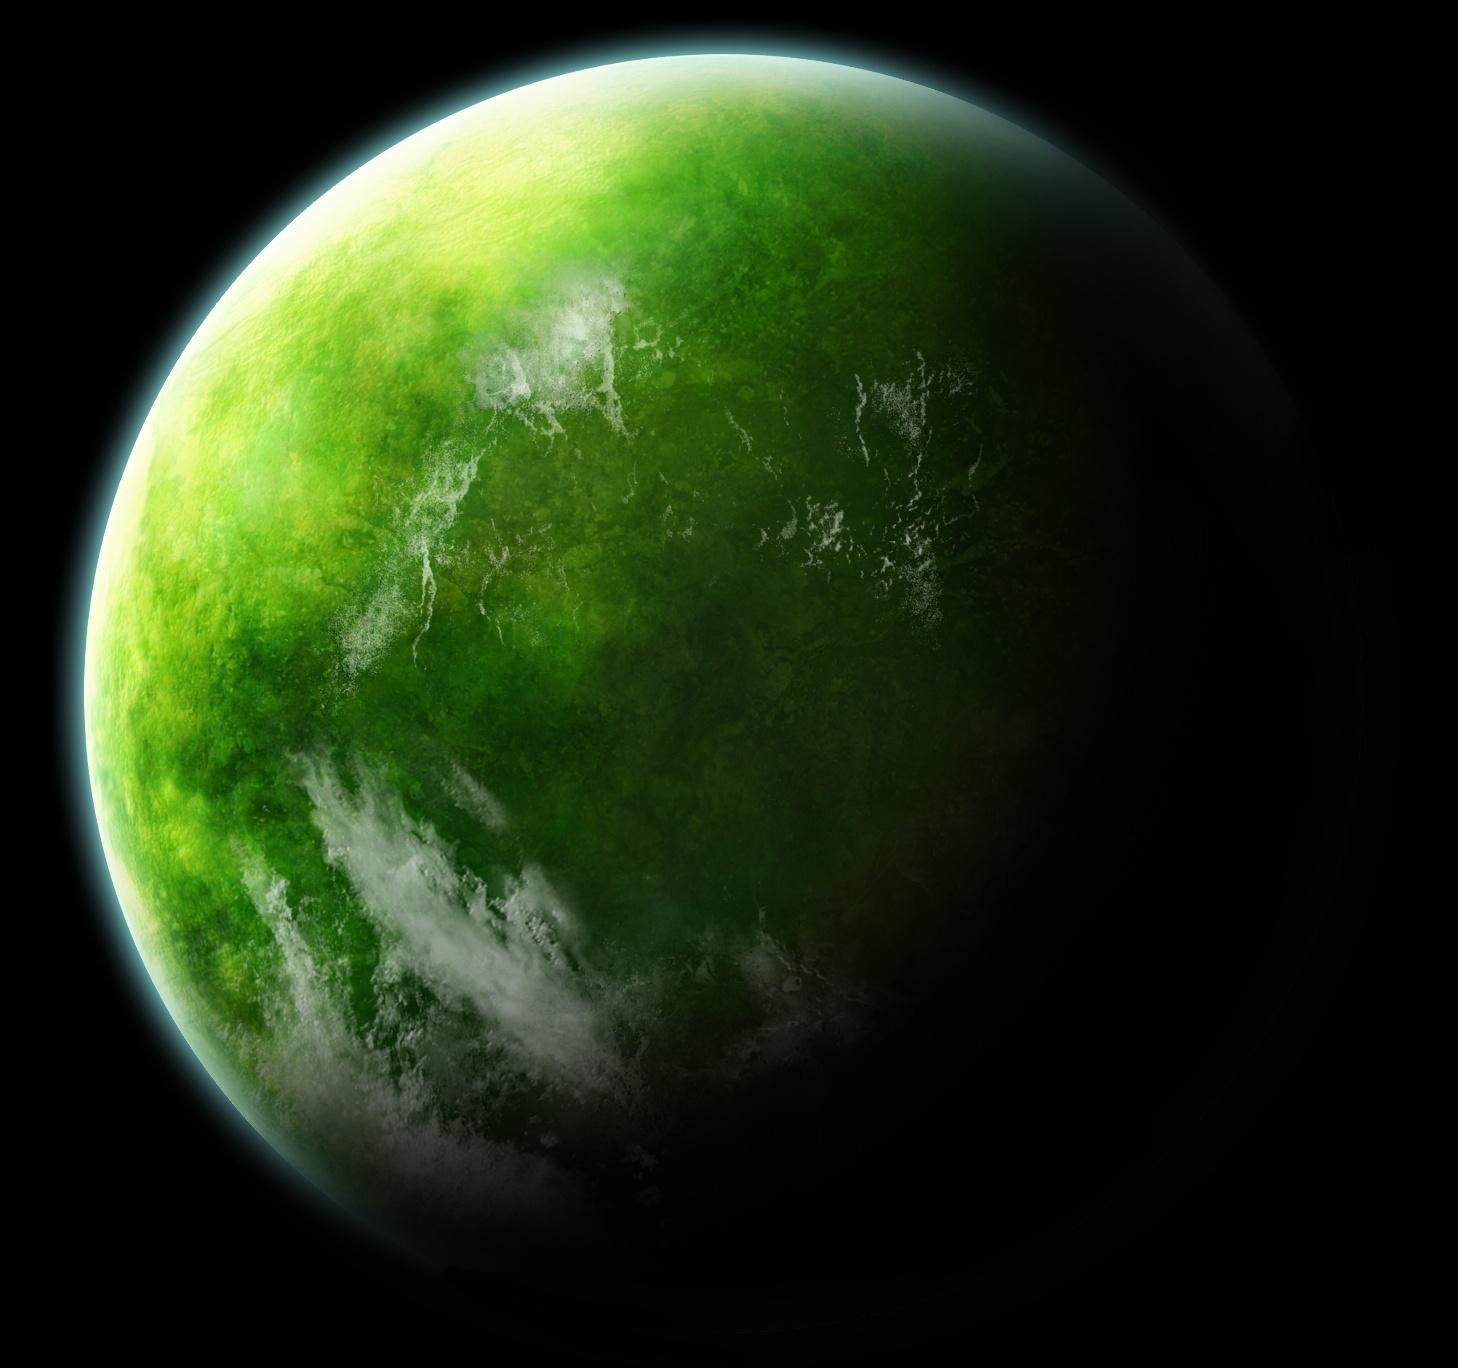 green_planet.jpg